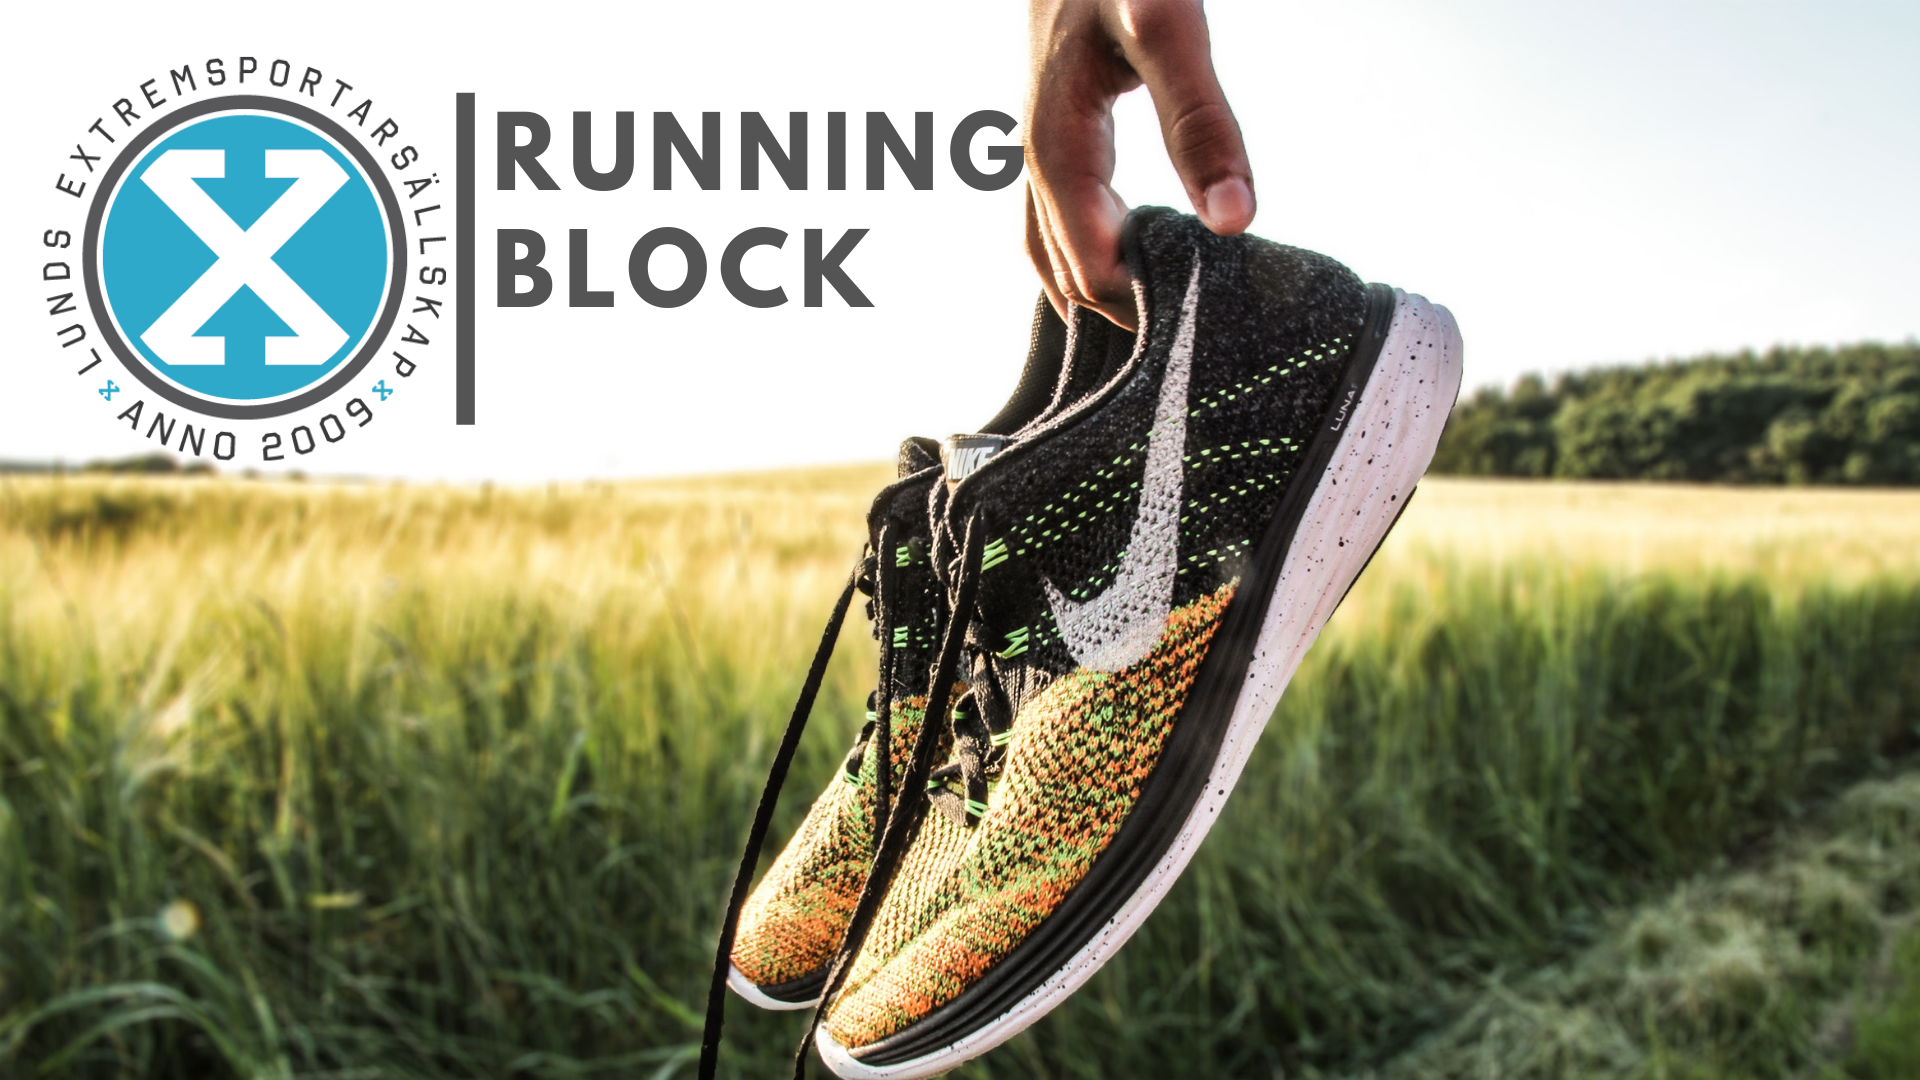 LESS | Running block